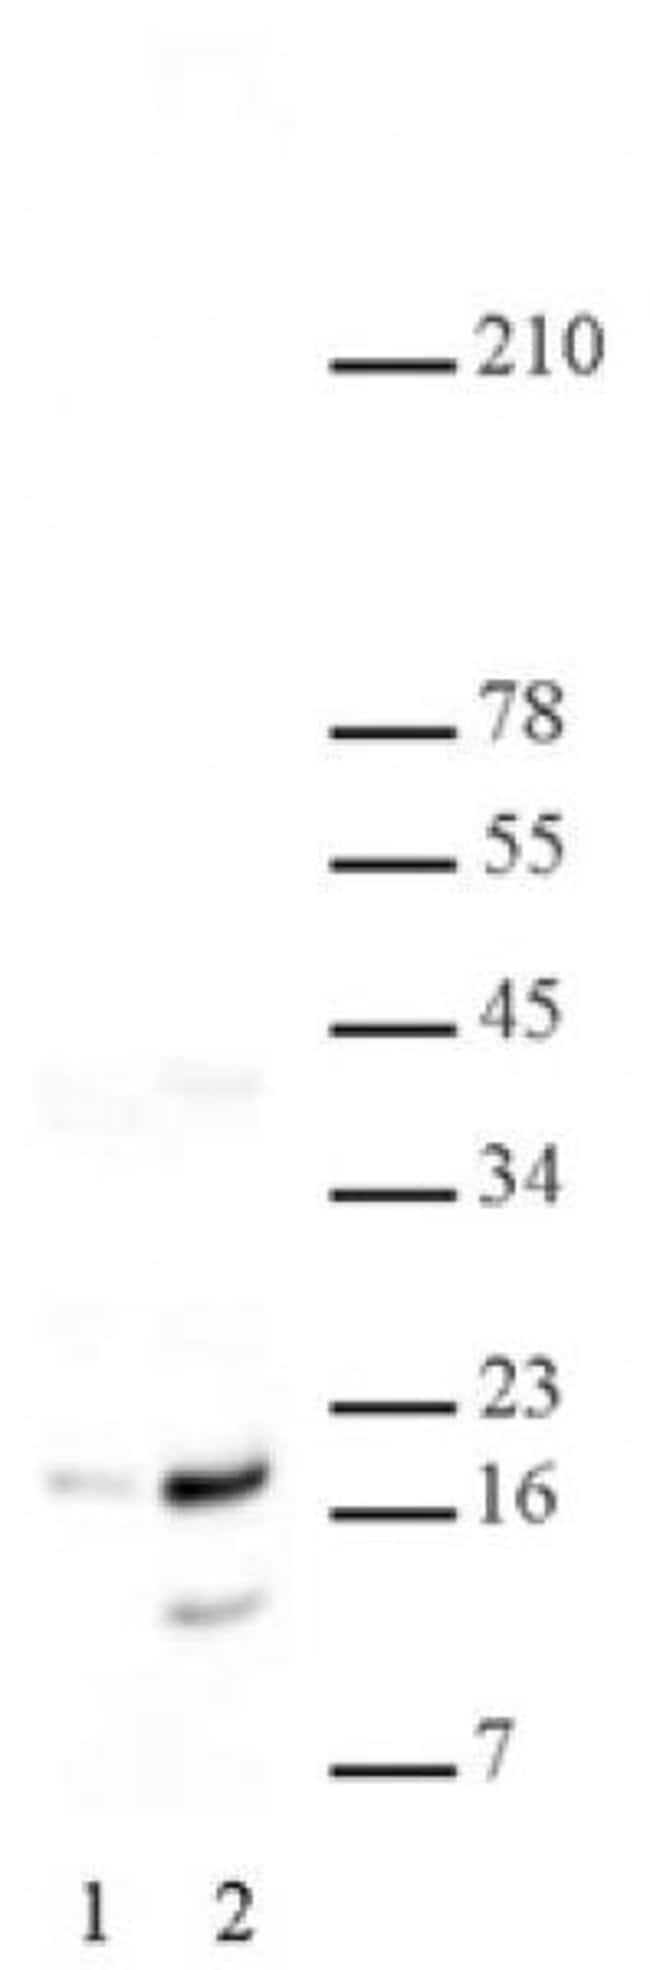 Histone H2A/H4S1ph Rabbit anti-Human, Unconjugated, Polyclonal, Active